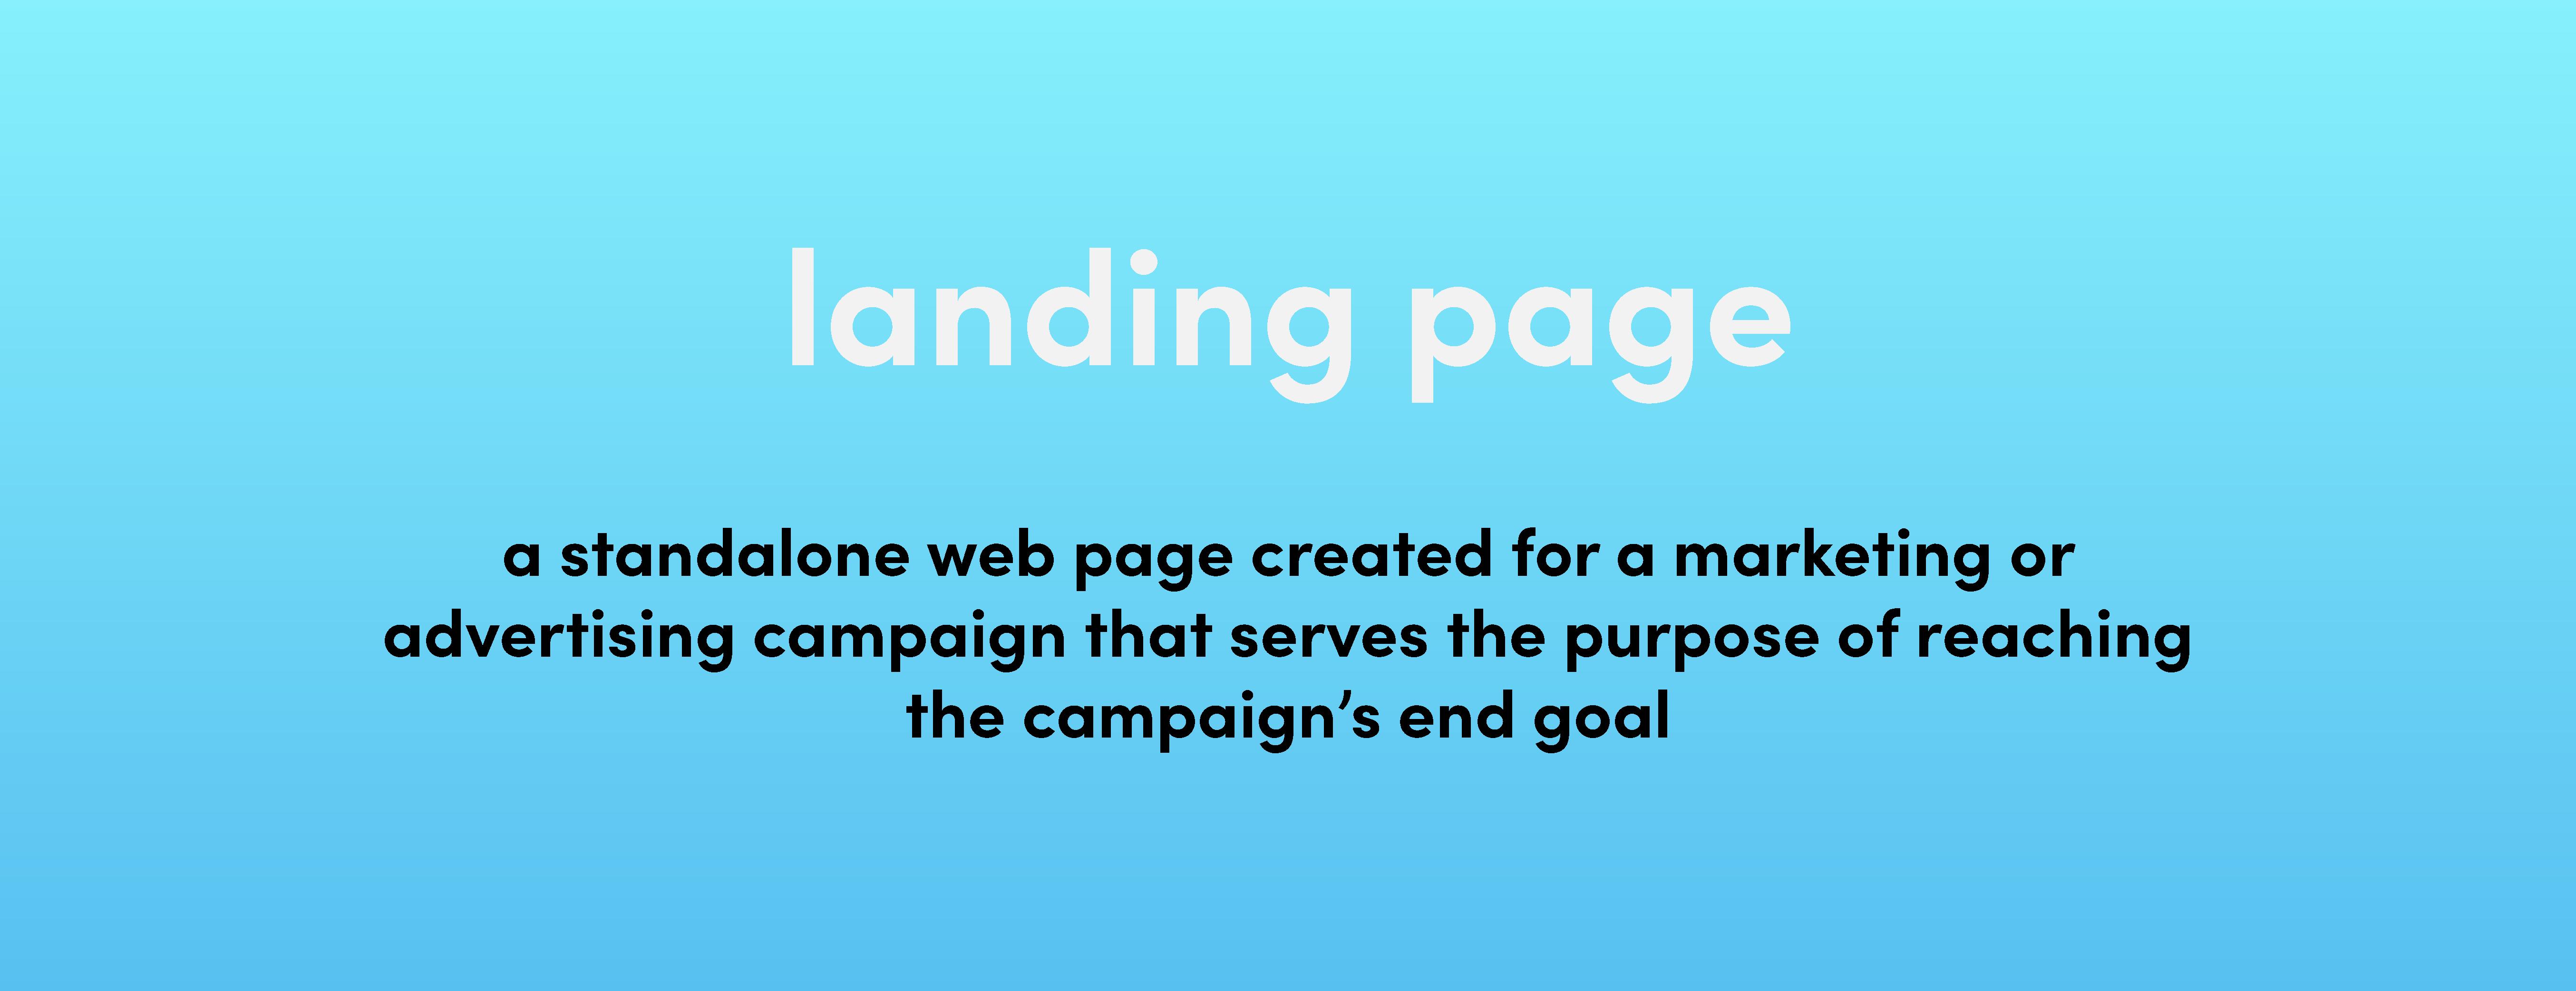 landing page definition on blue backgroud